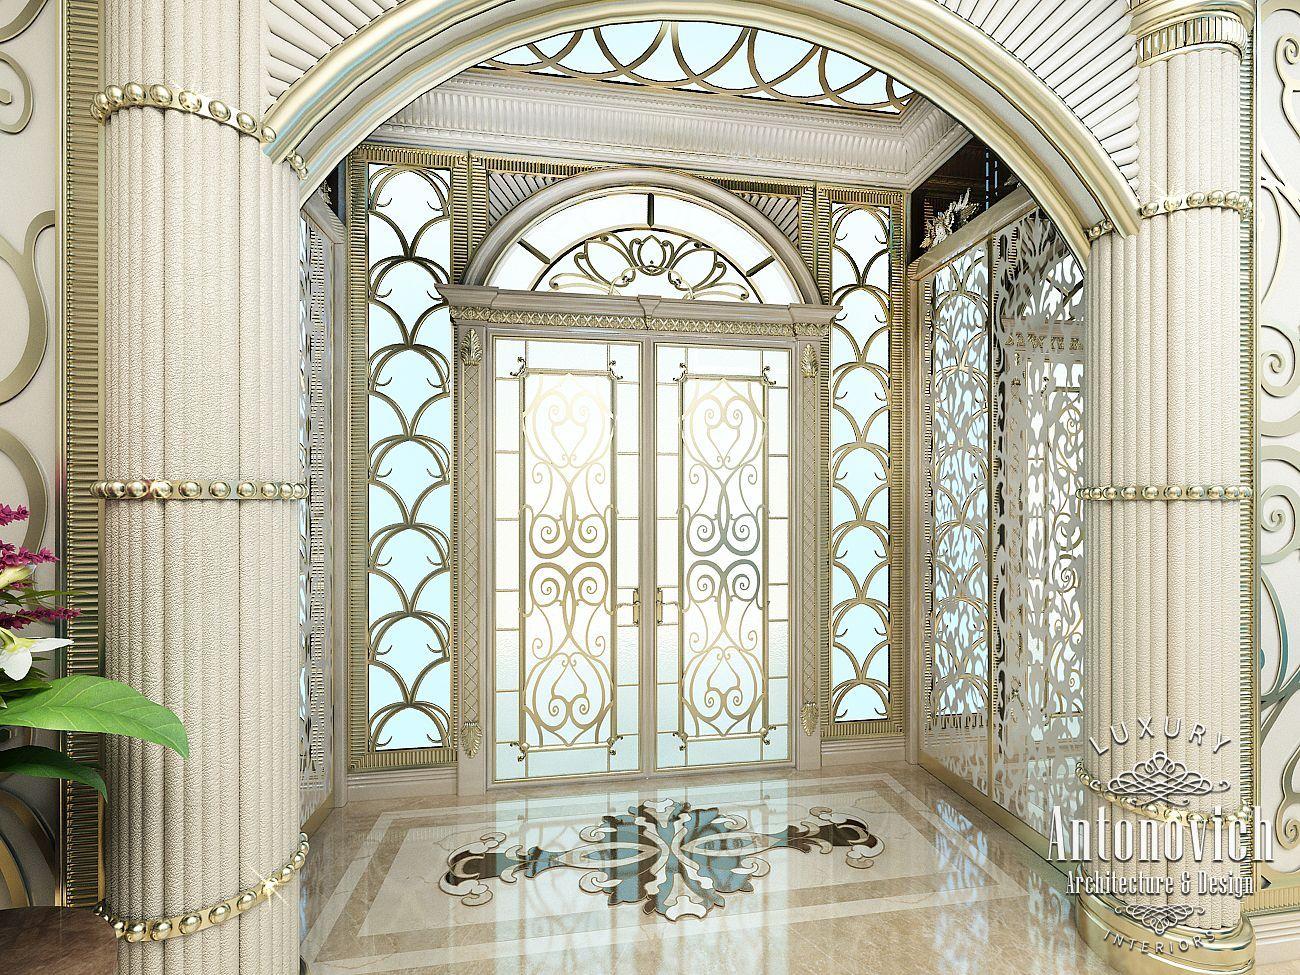 LUXURY ANTONOVICH DESIGN UAE: Interior In Oriental Style